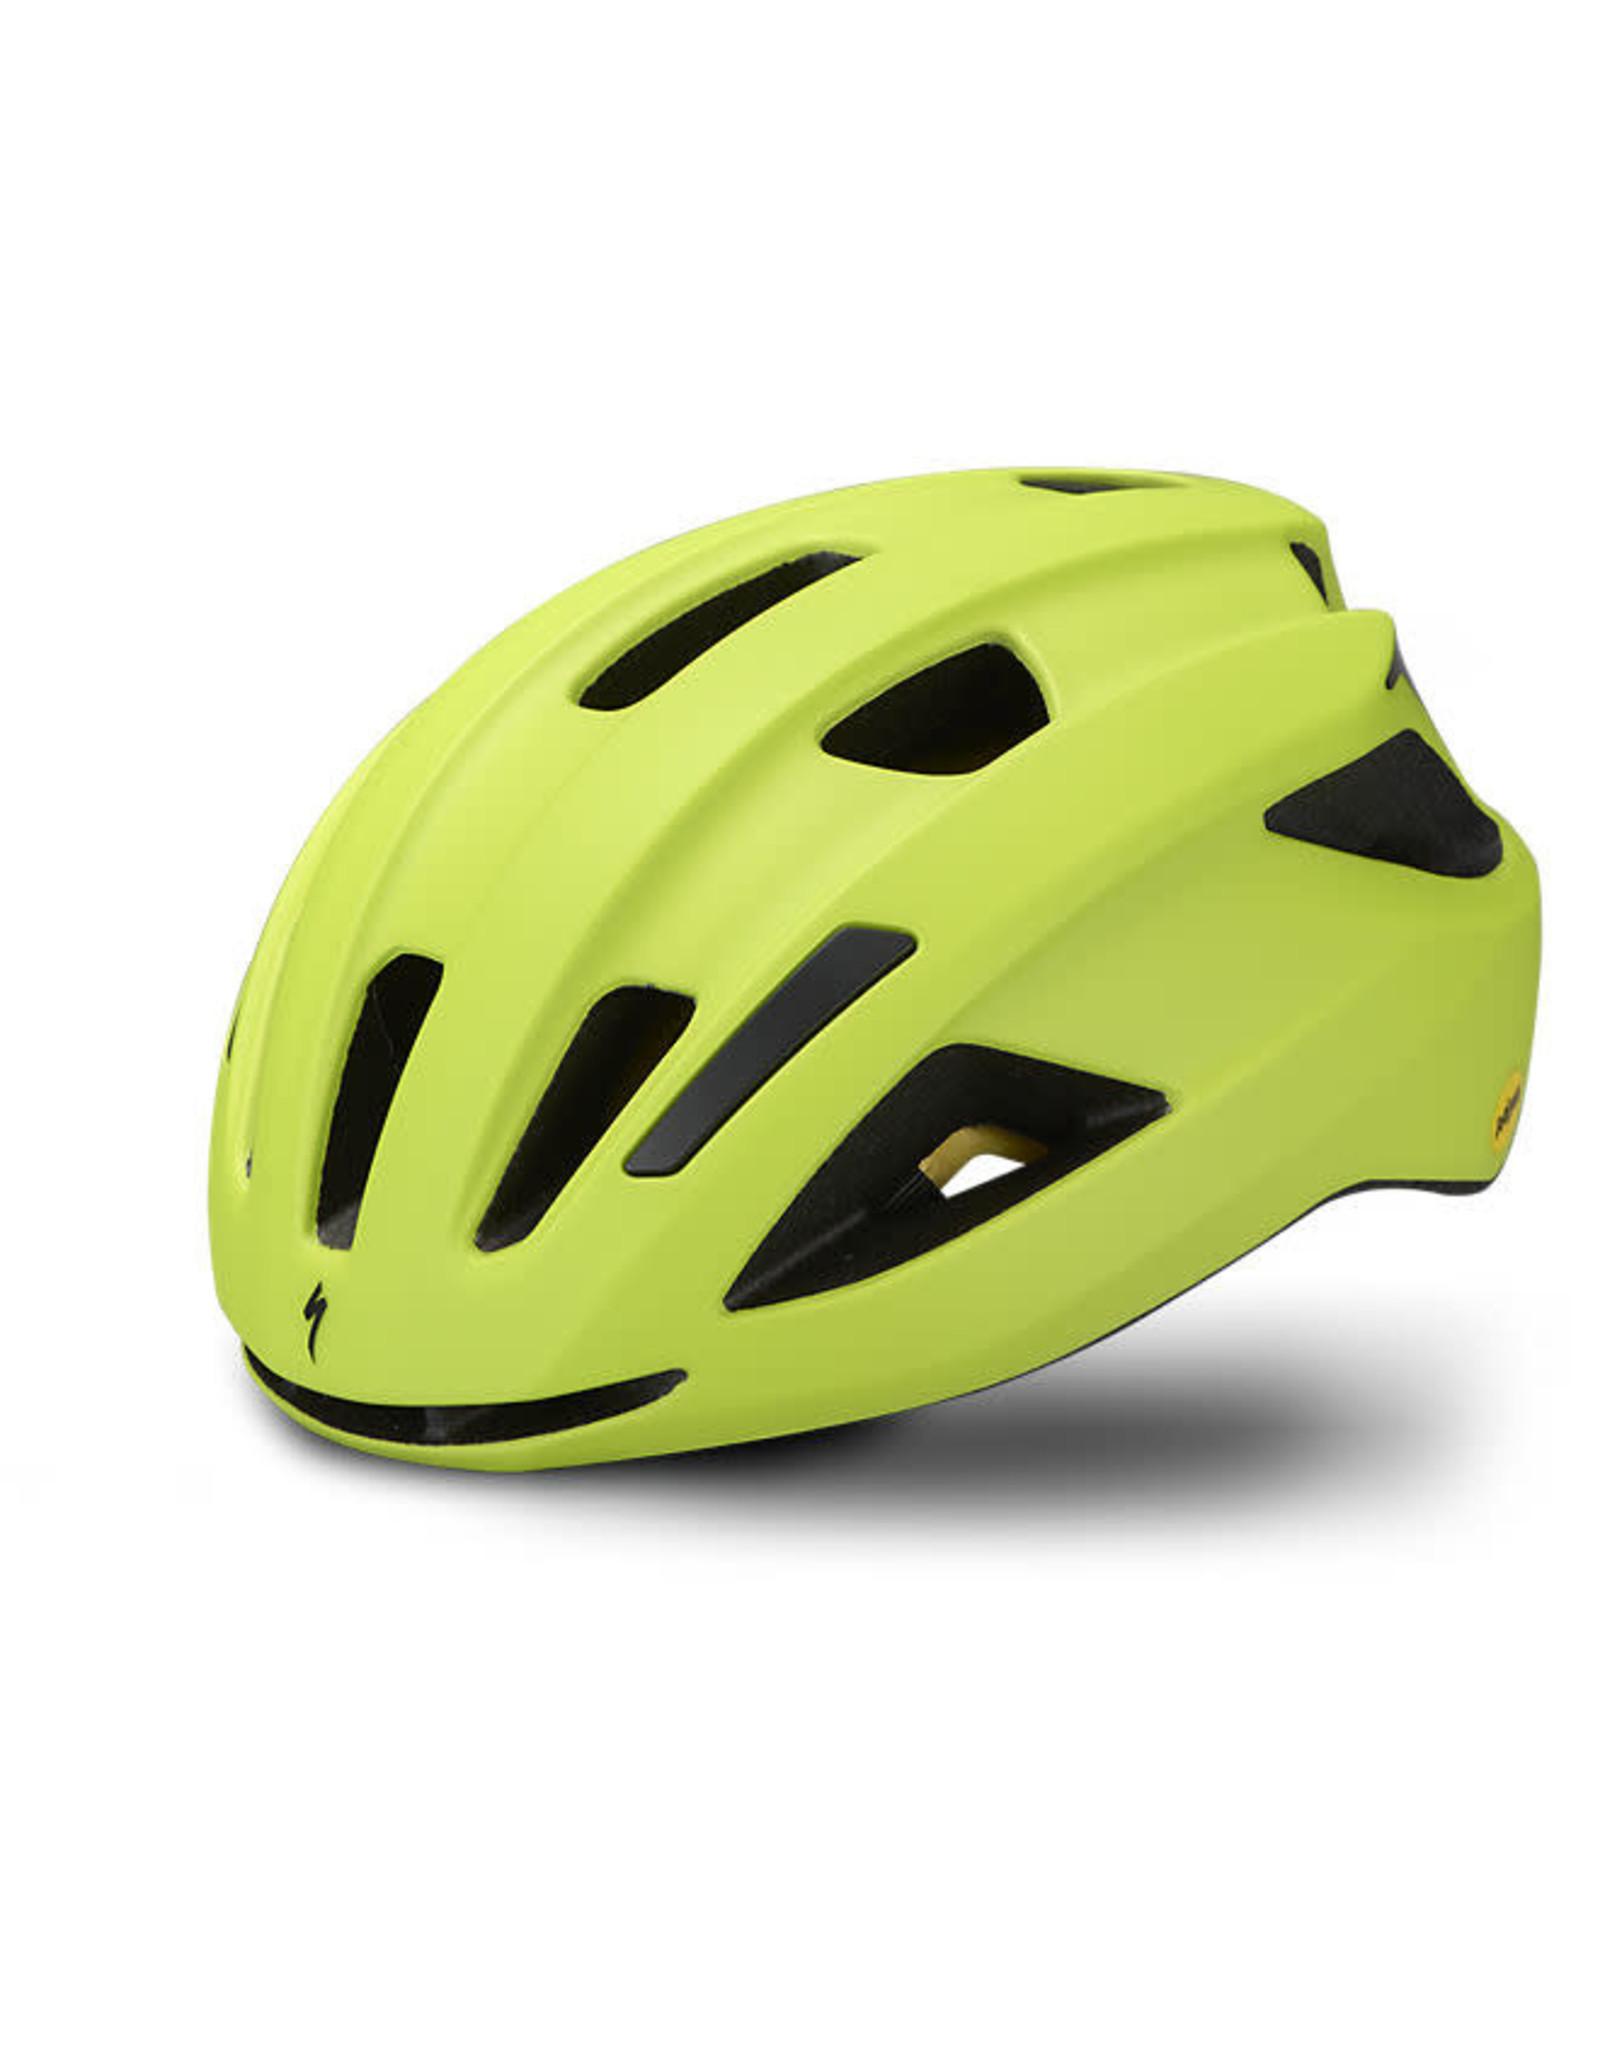 Specialized Specialized Align II Helmet Hyperviz/Black Reflective S/M